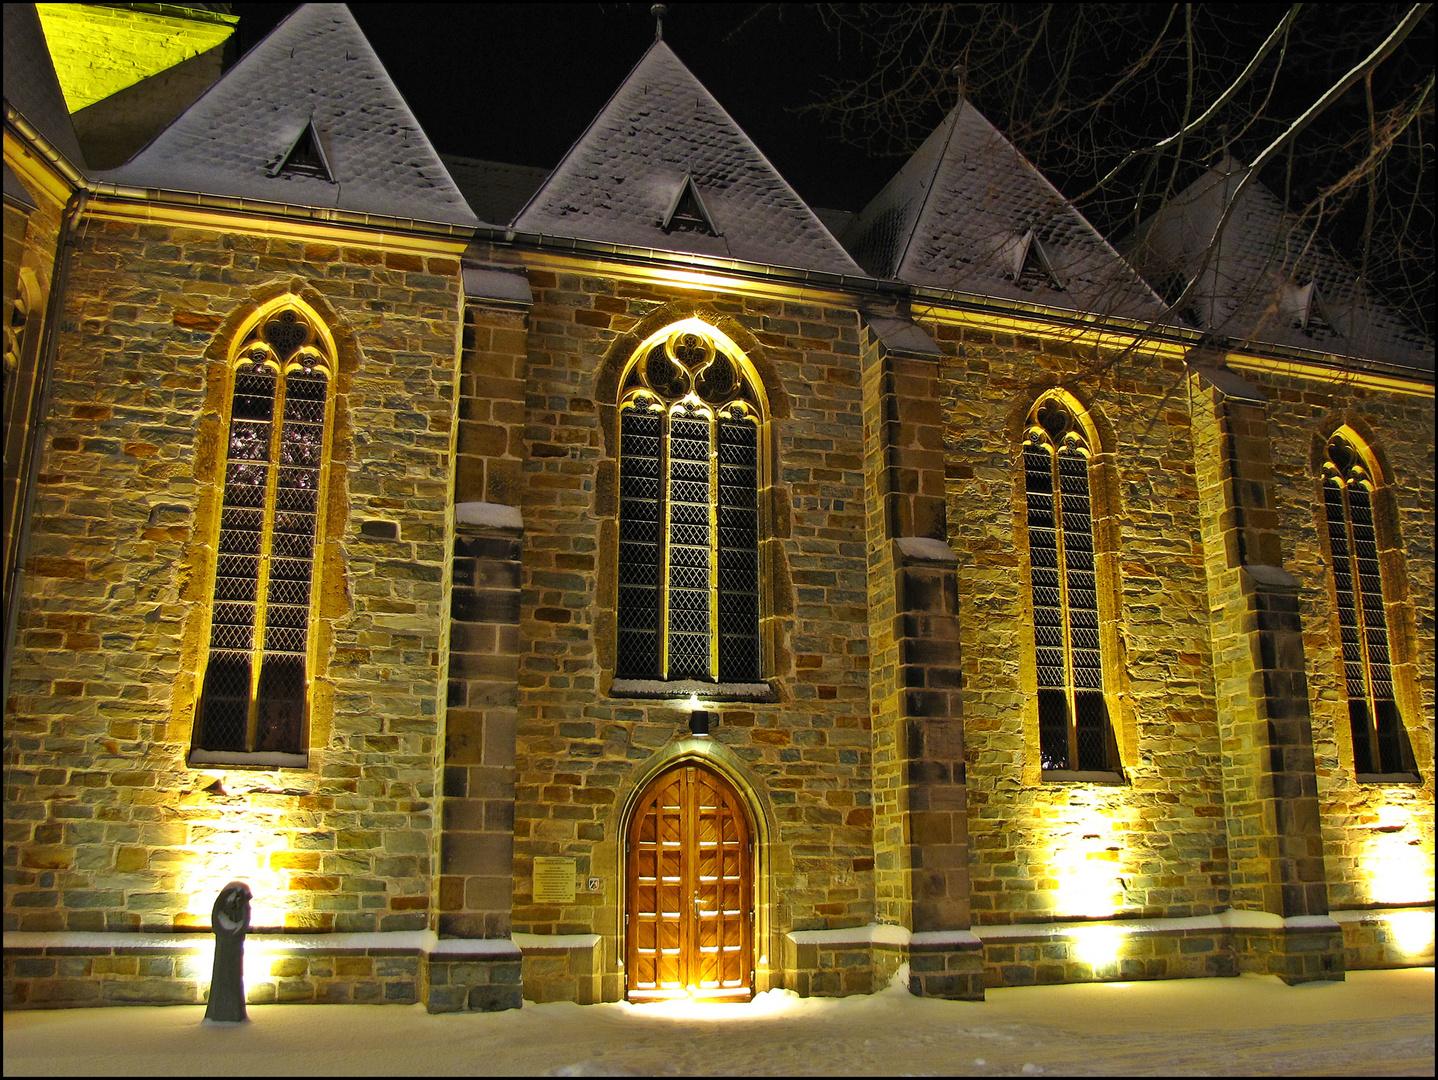 Pfarrkirche St. Lambertus Langenberg